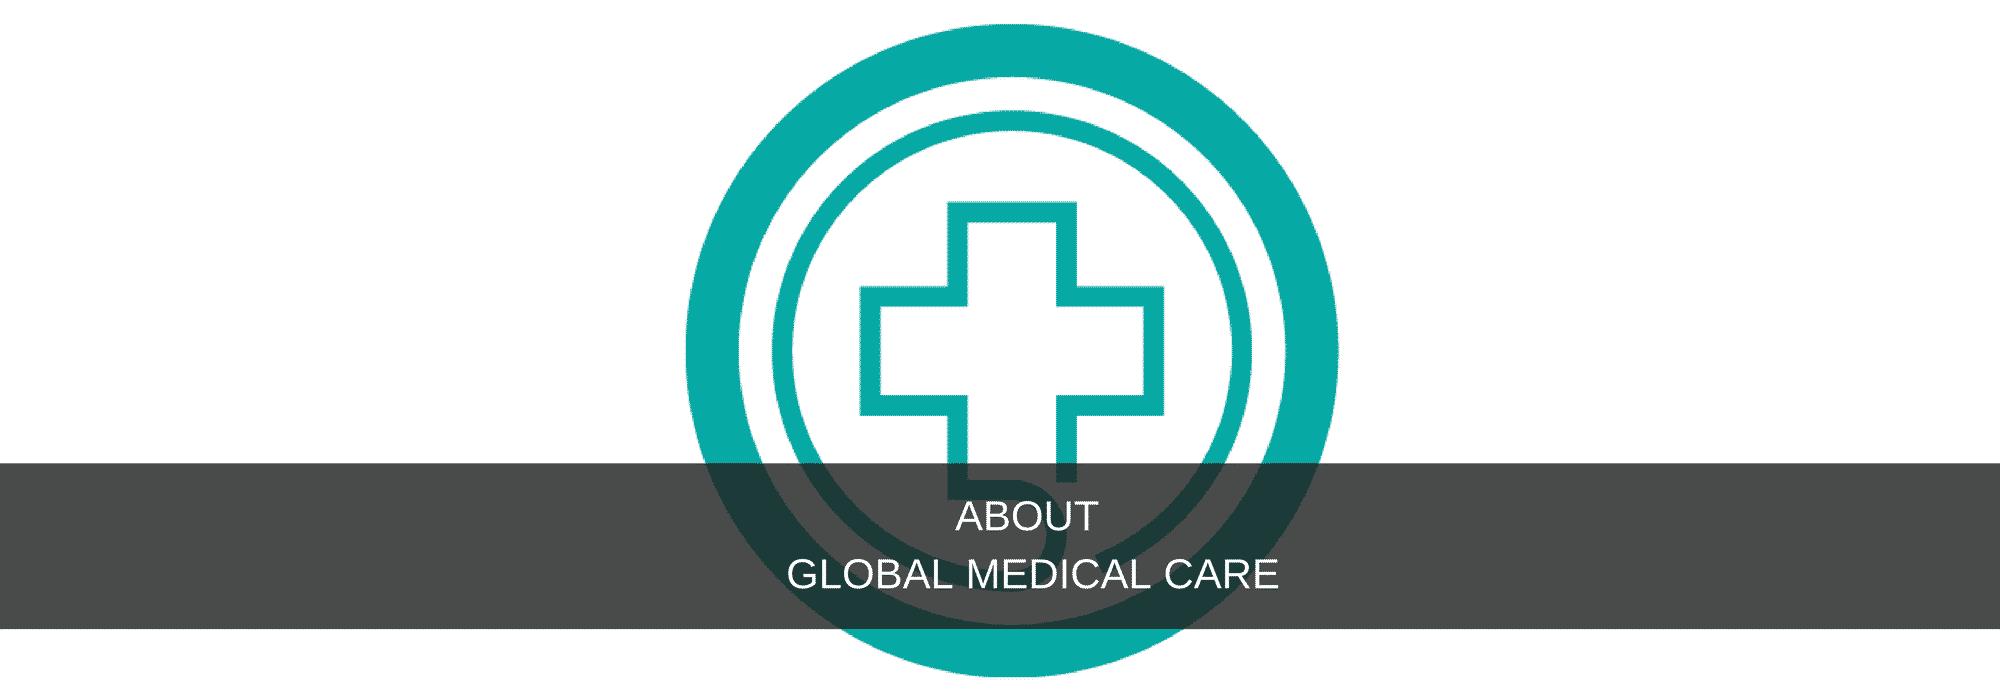 Global Medical Care FAQ - Global Medical Care